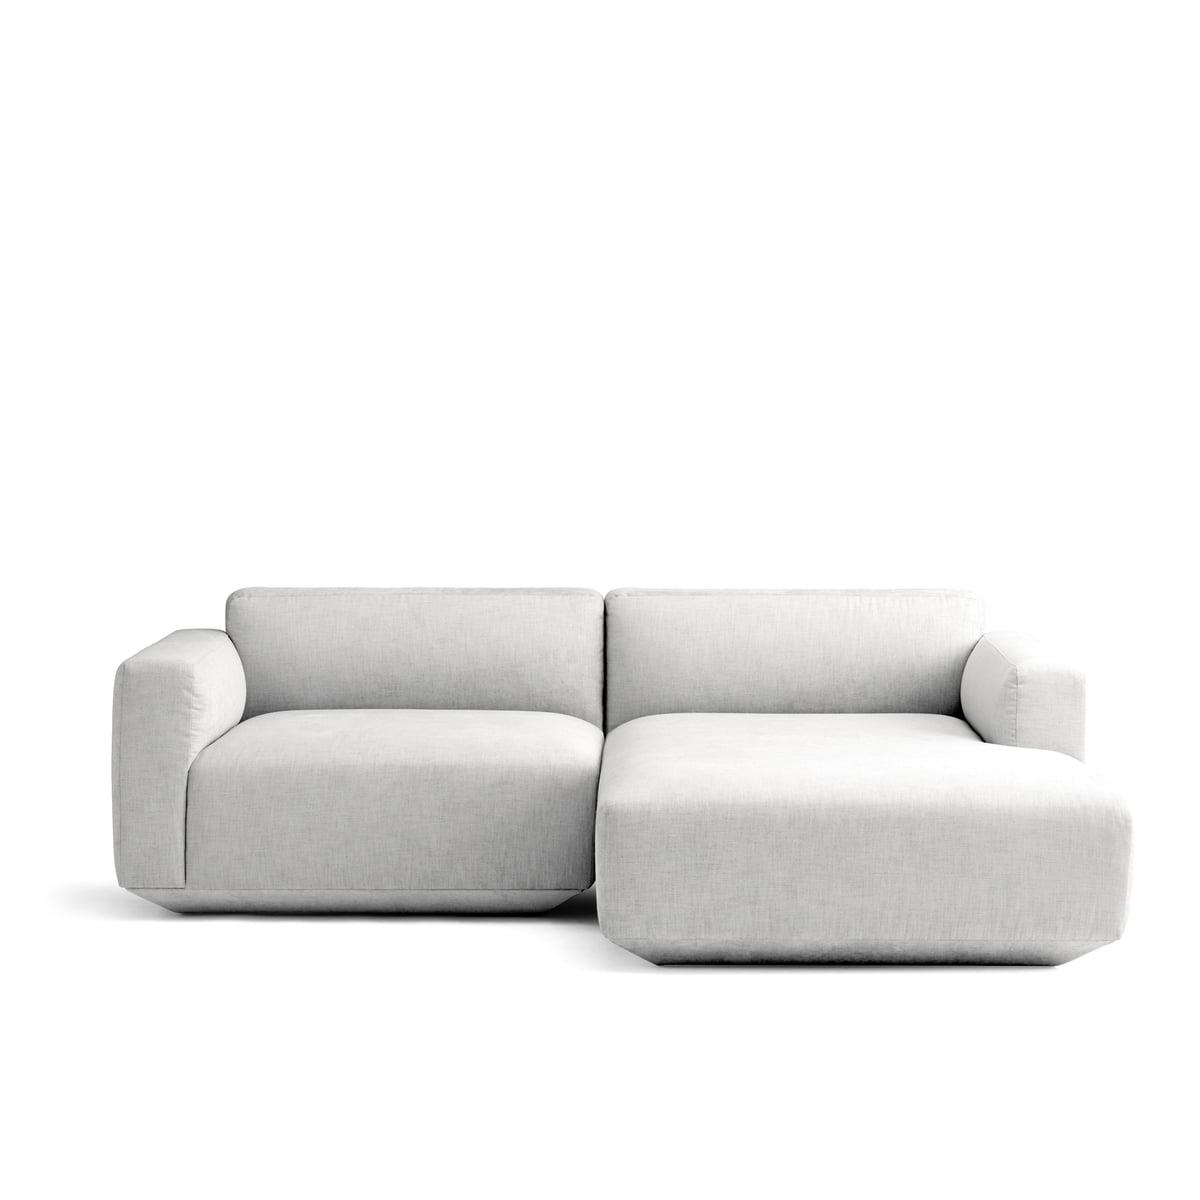 Andtradition develius eck sofa konfiguration b kvadrat maple 112